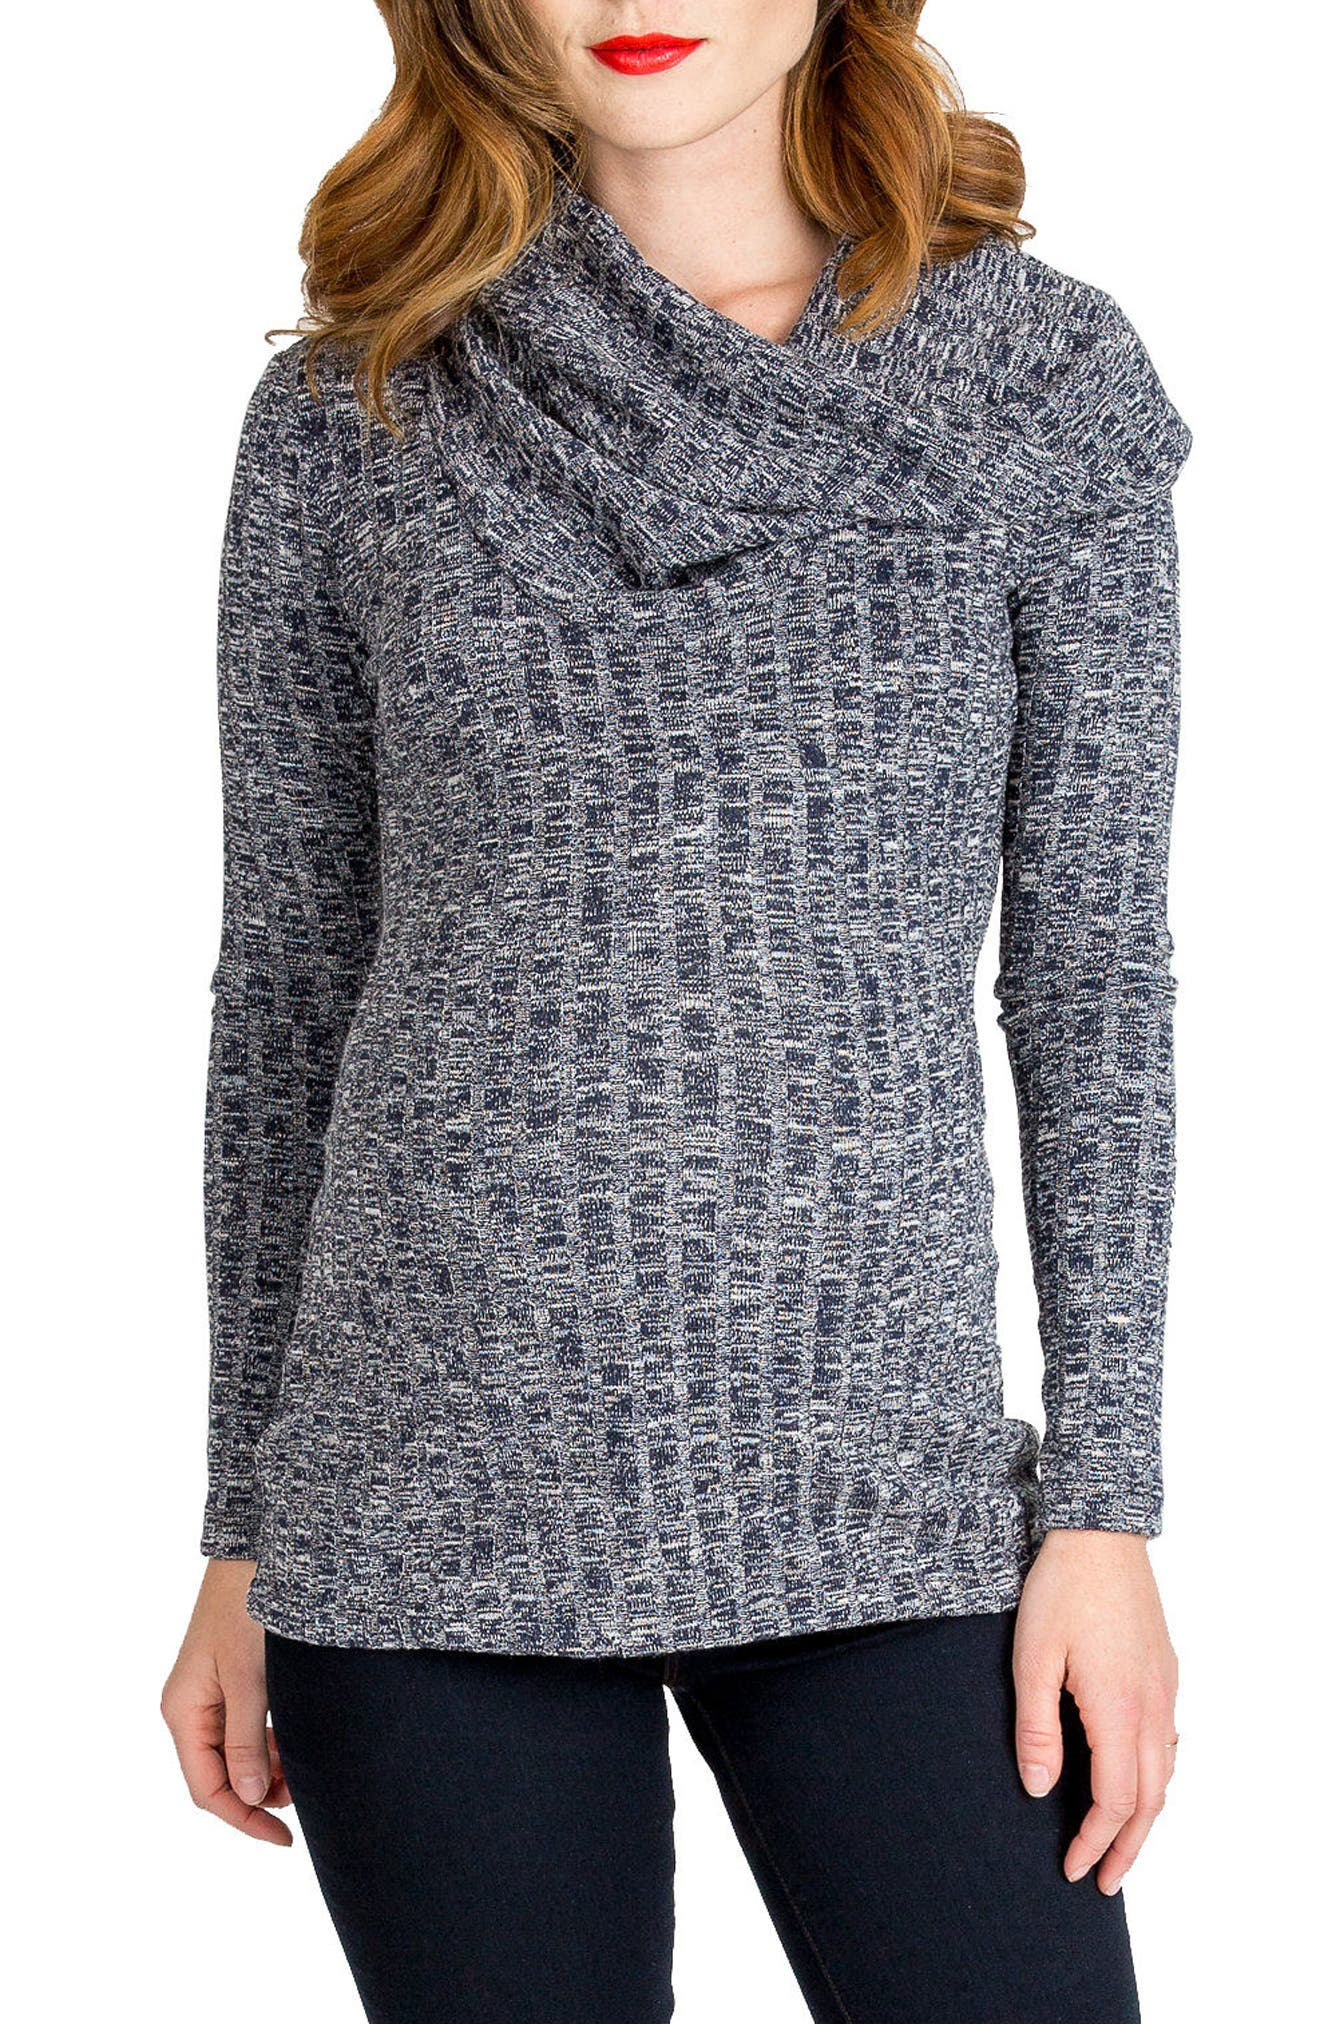 NOM MATERNITY Ophelia Cowl Neck Maternity Sweater, Main, color, NAVY HEATHER RIB